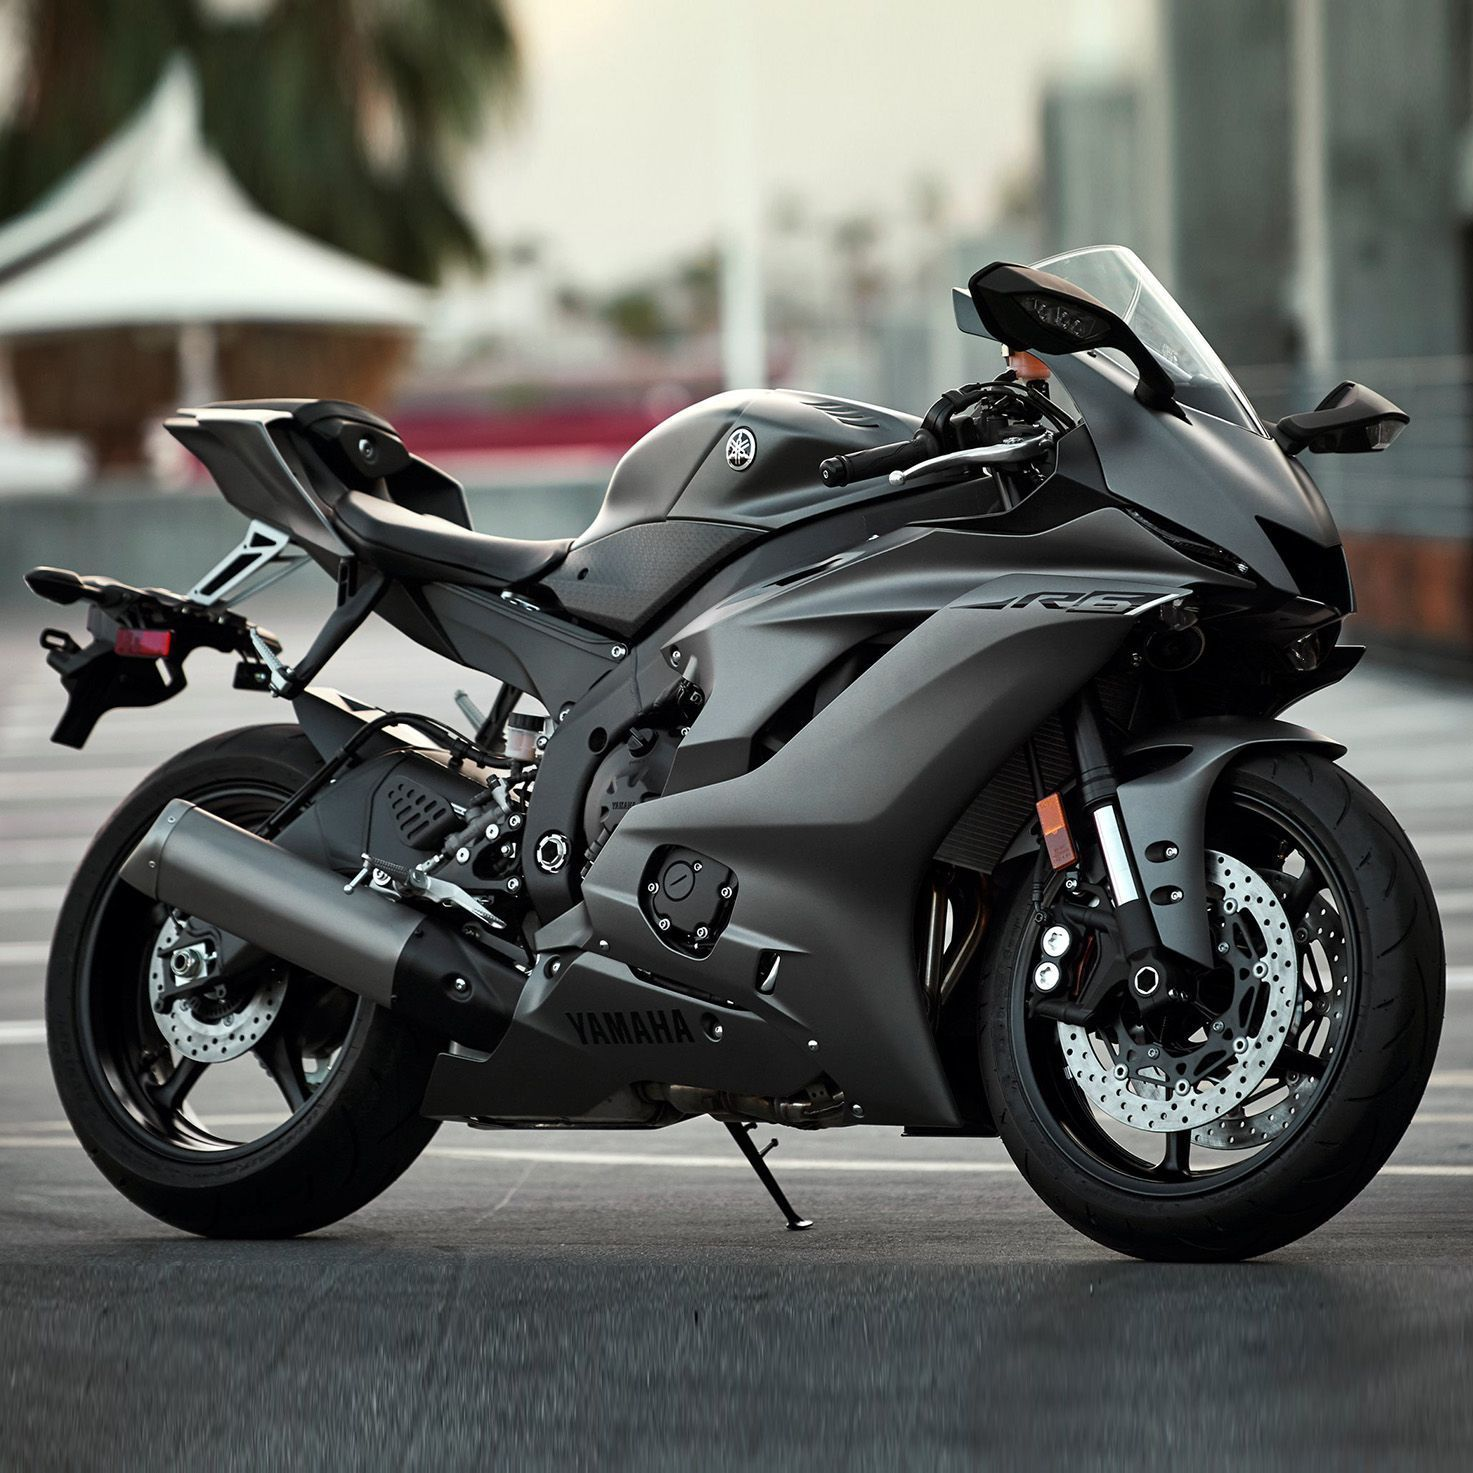 New bike 2020